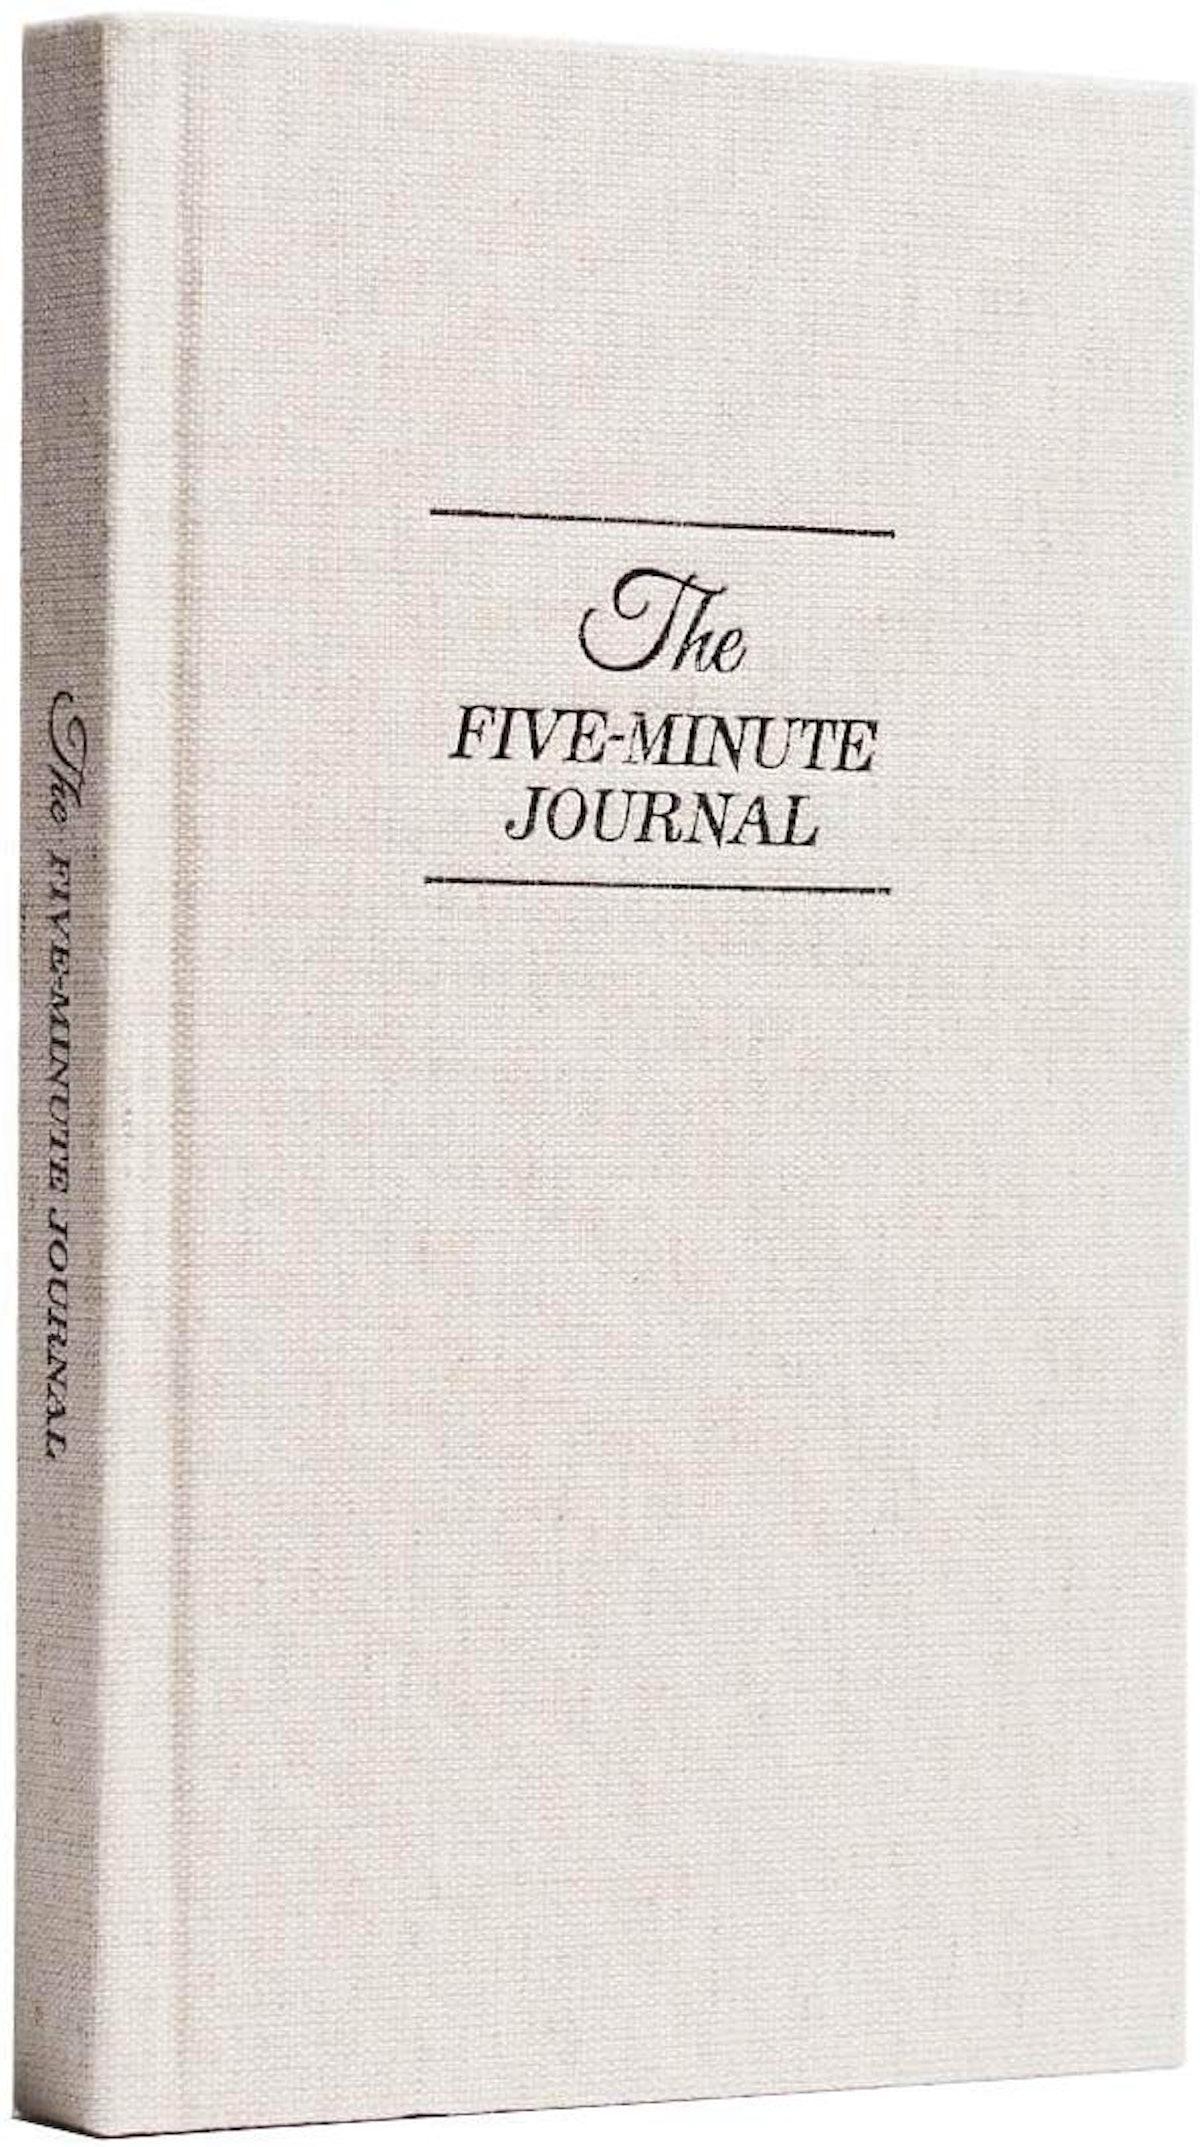 The Five-Minute Gratitude Journal